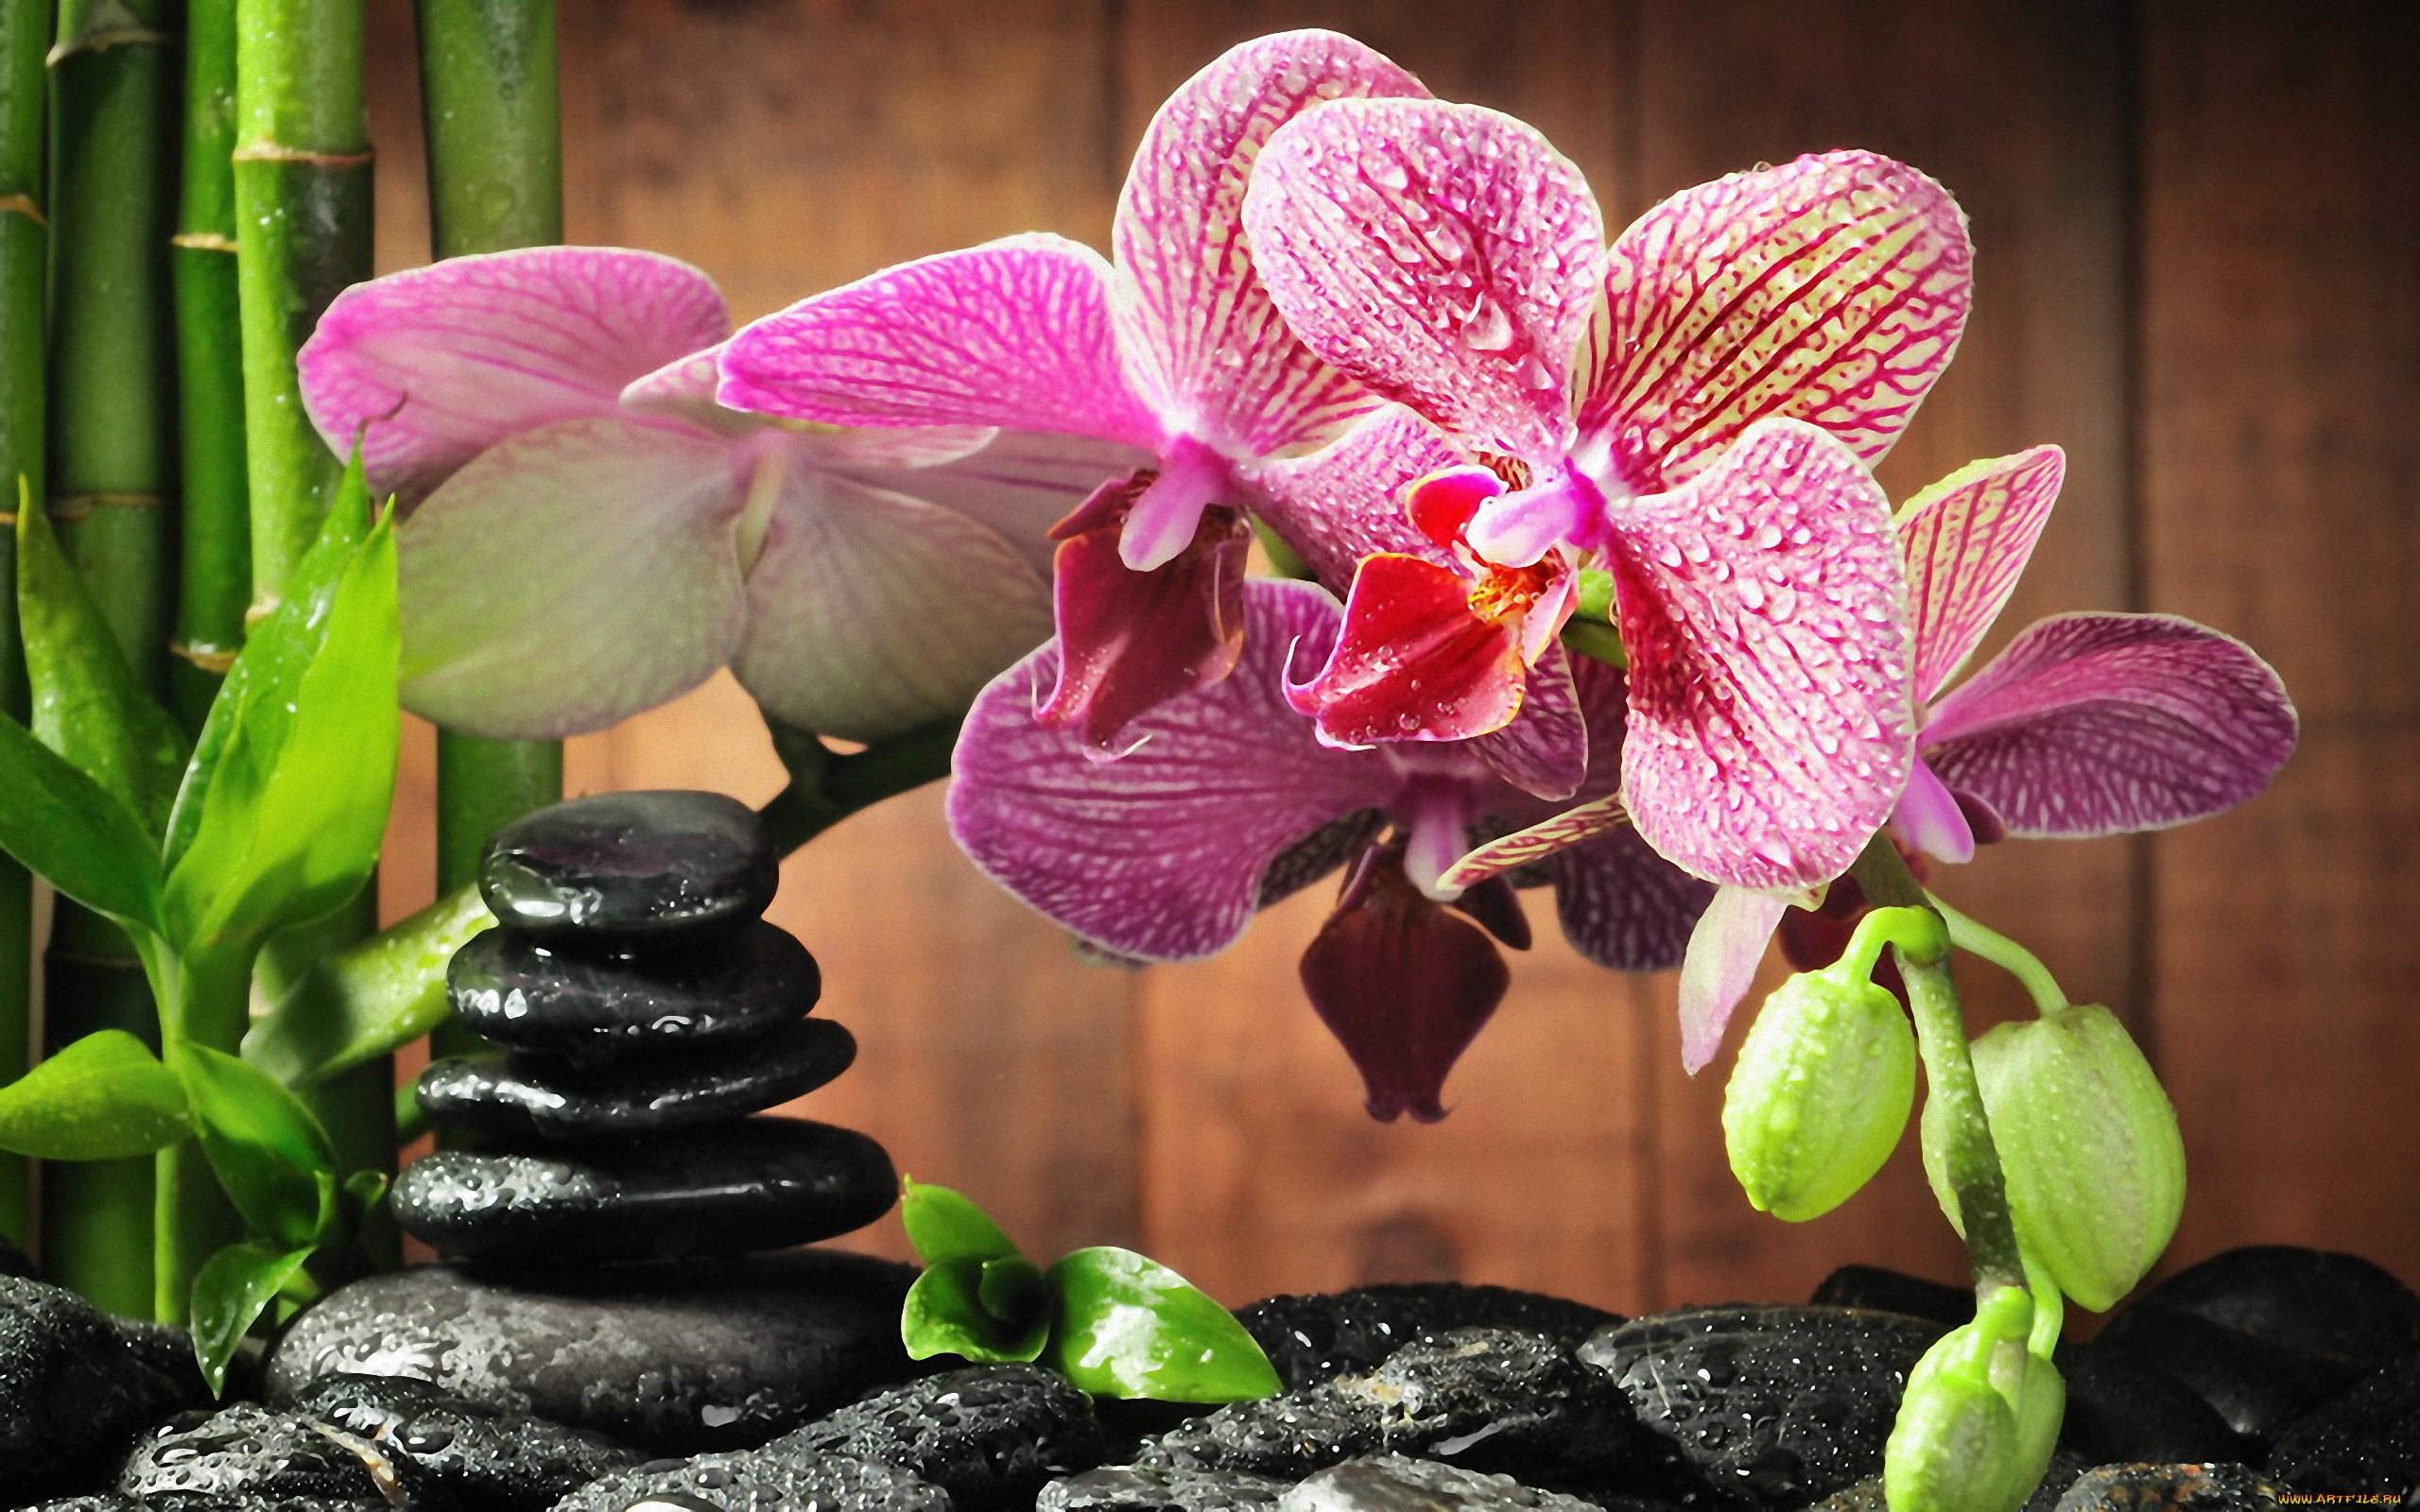 Shenzhen Nongke Orchid Photos